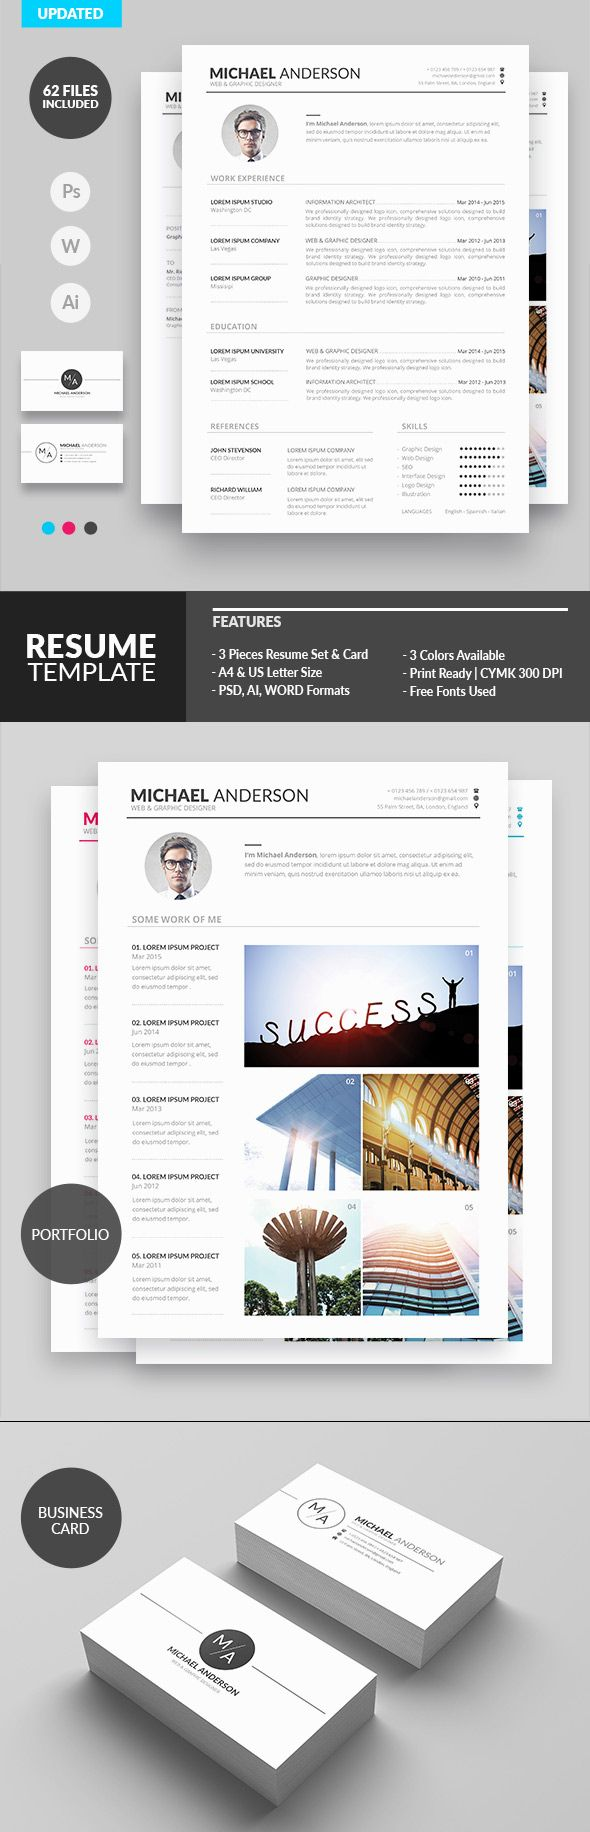 Minimal Resume Design for Creatives | cv | Pinterest | Diseño y ...